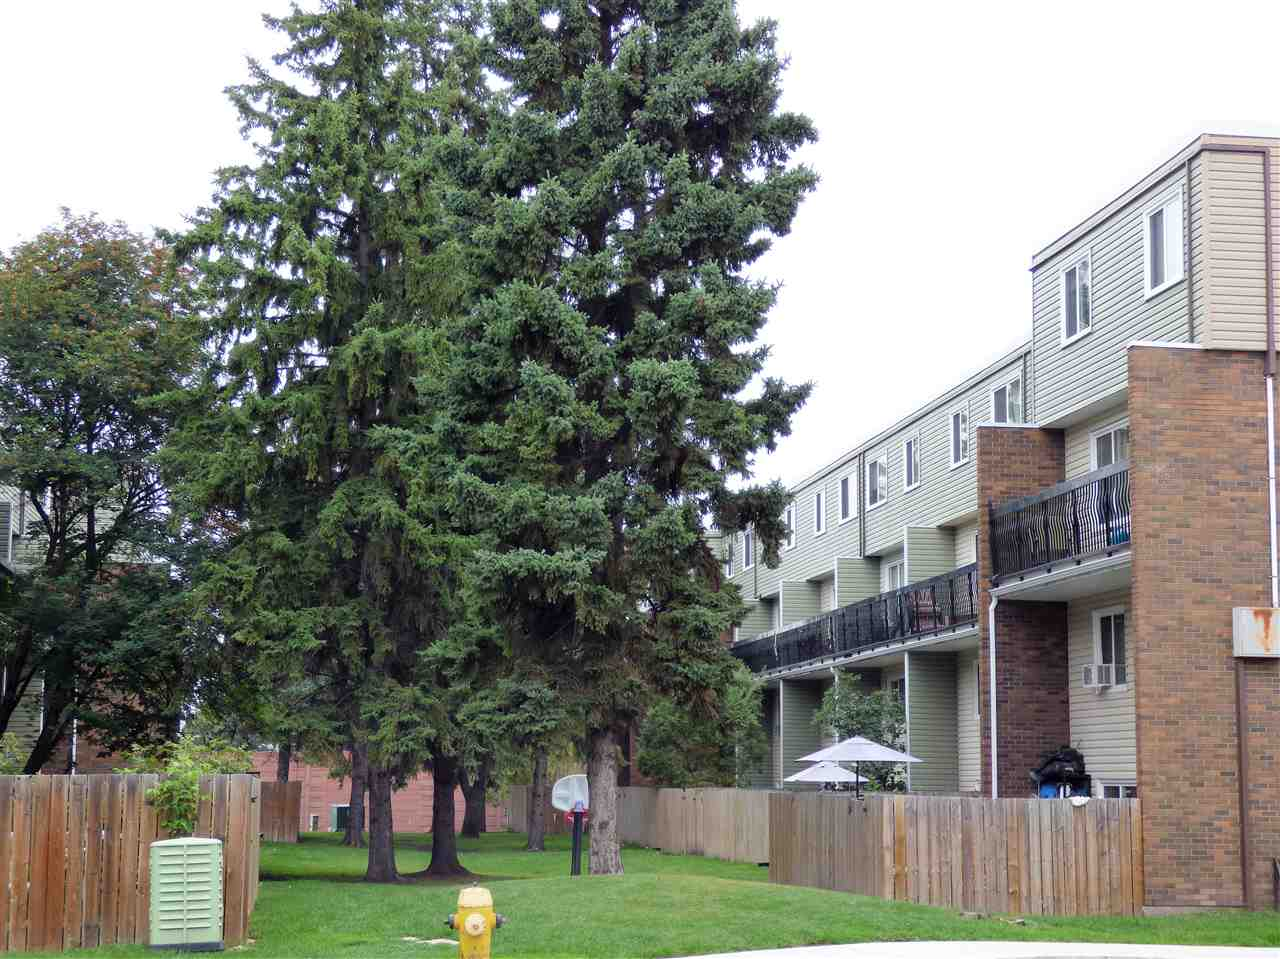 For Sale: 208 - 7835 159 Street, Edmonton, AB | 2 Bed, 2 Bath Condo for $159,700. See 13 photos!